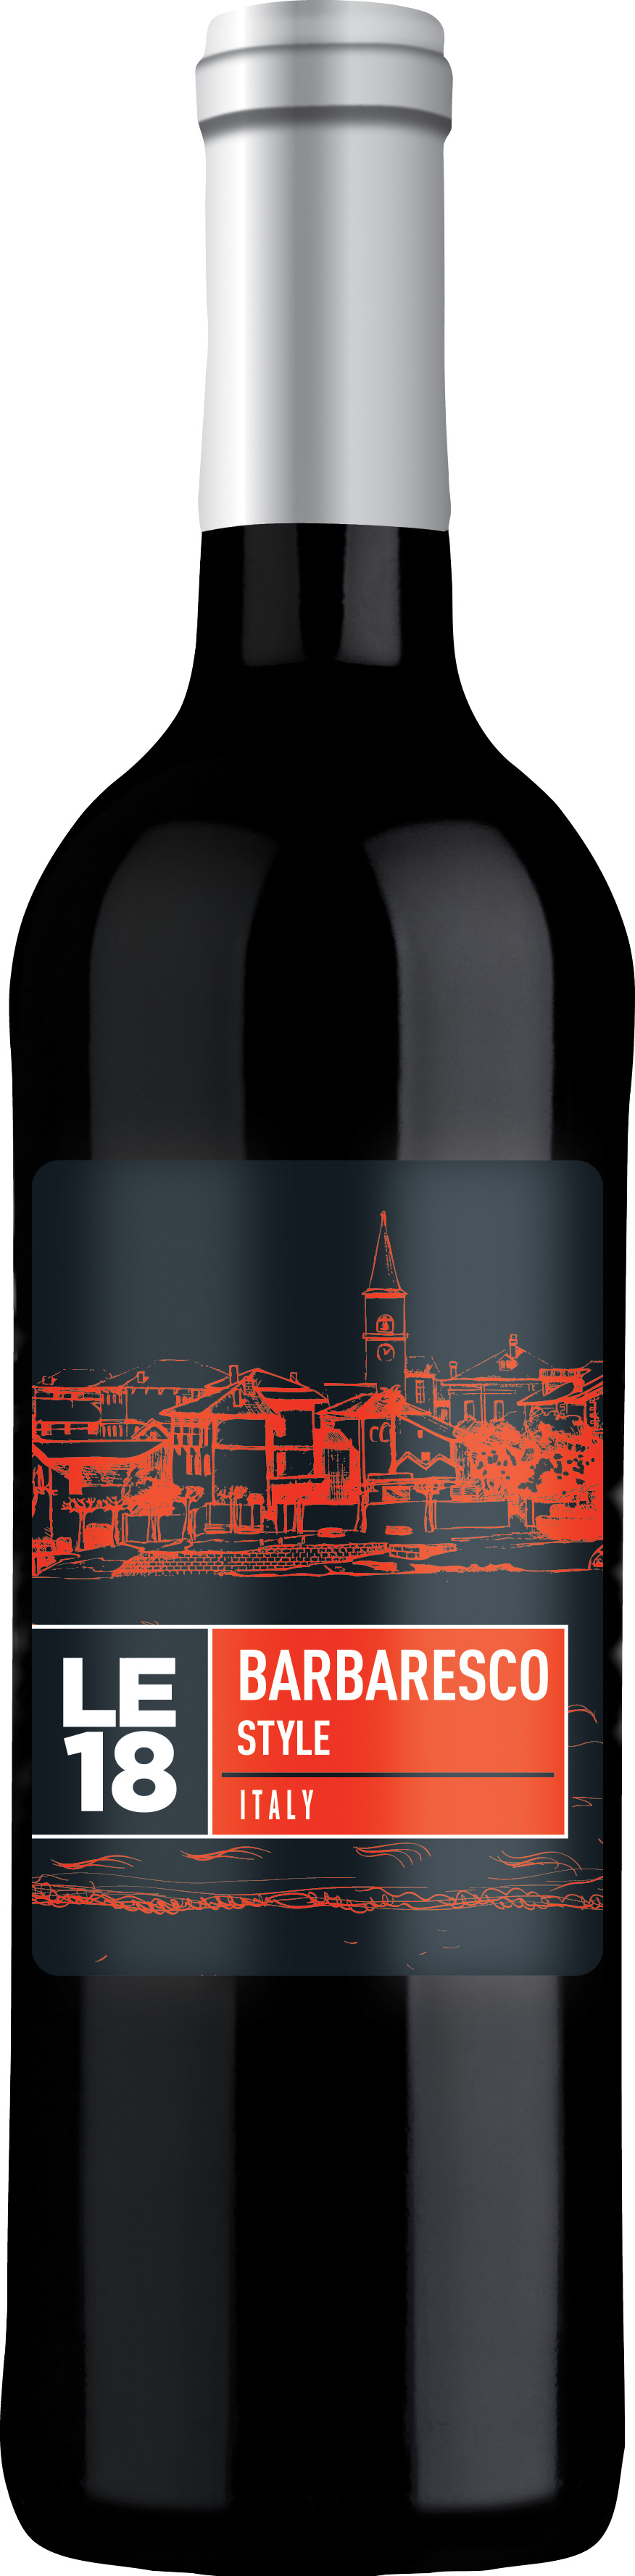 18123 WX_LE18 Barbaresco Bottle.jpg